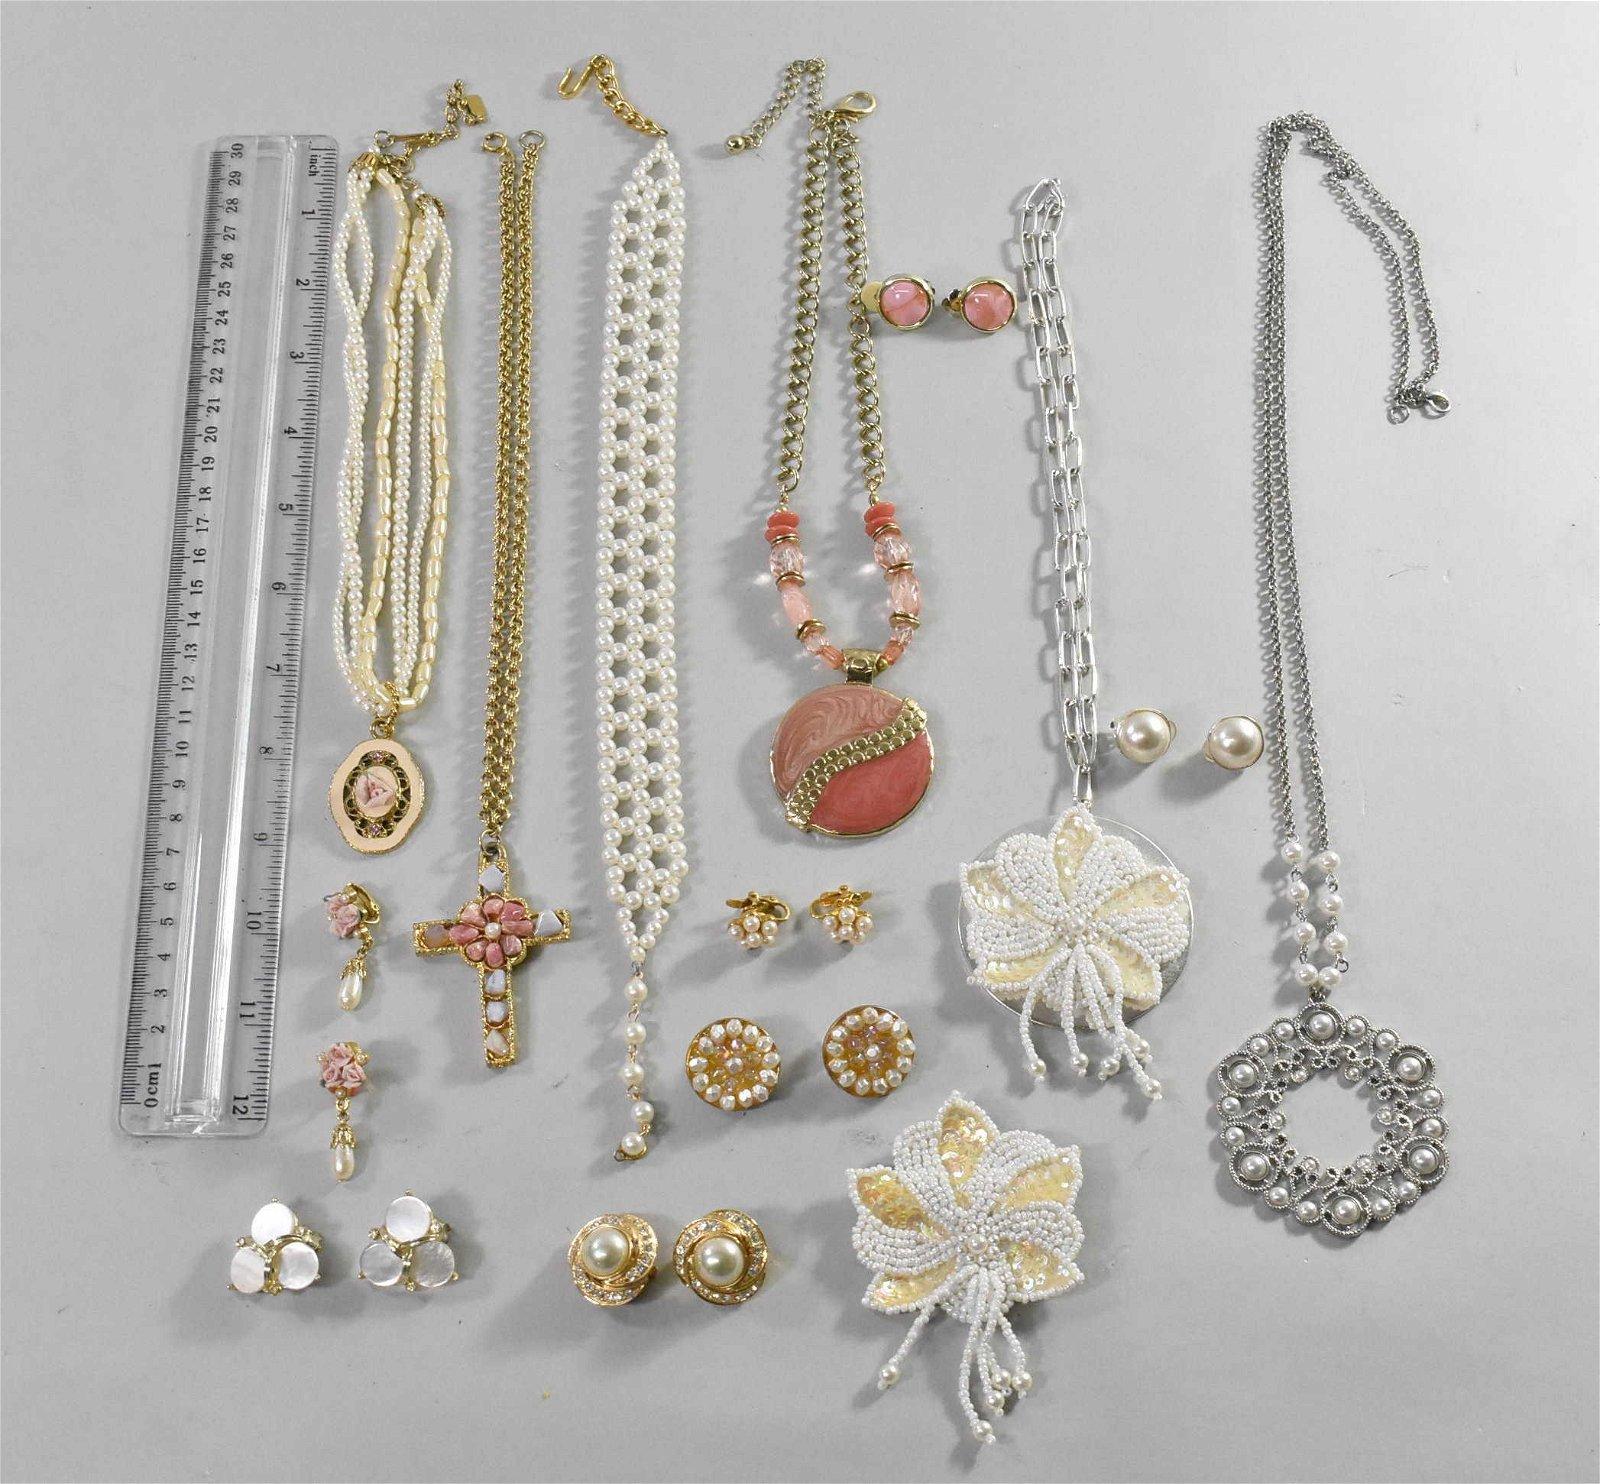 1928,  Lisner,  Brooch W/ Rose, Sequin Costume Jewelry